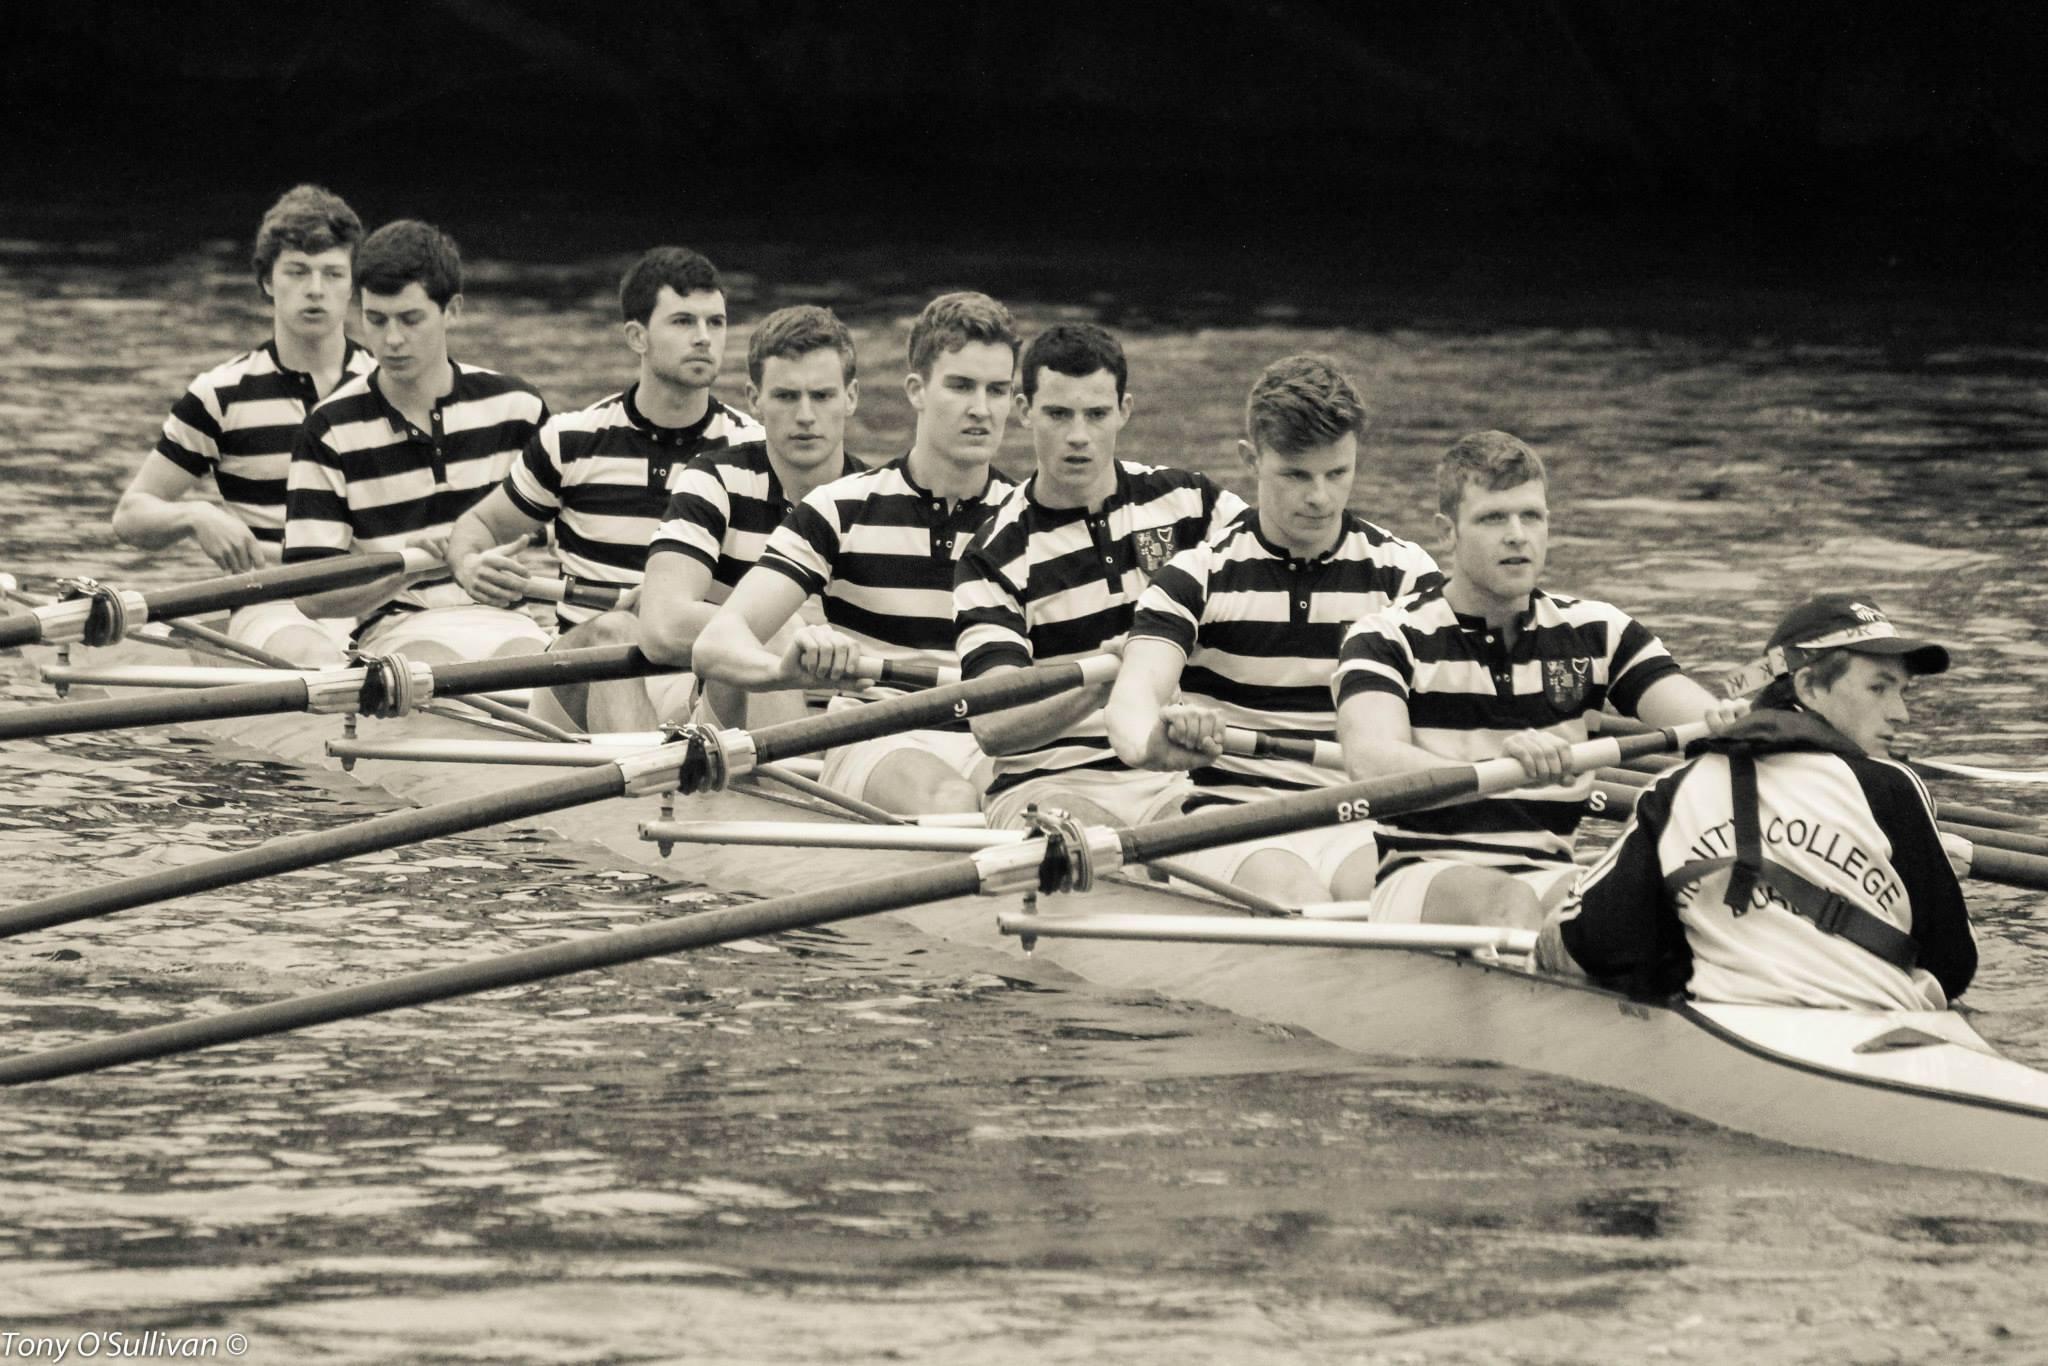 Ready to make history- the Gannon VIII- Bow: A. Browne, W. Doyle, J. Magan, M. Corcoran, P. Moreau, M. Kelly, L. Hawkes, Stk: D. Butler, Cox: C. Flynn